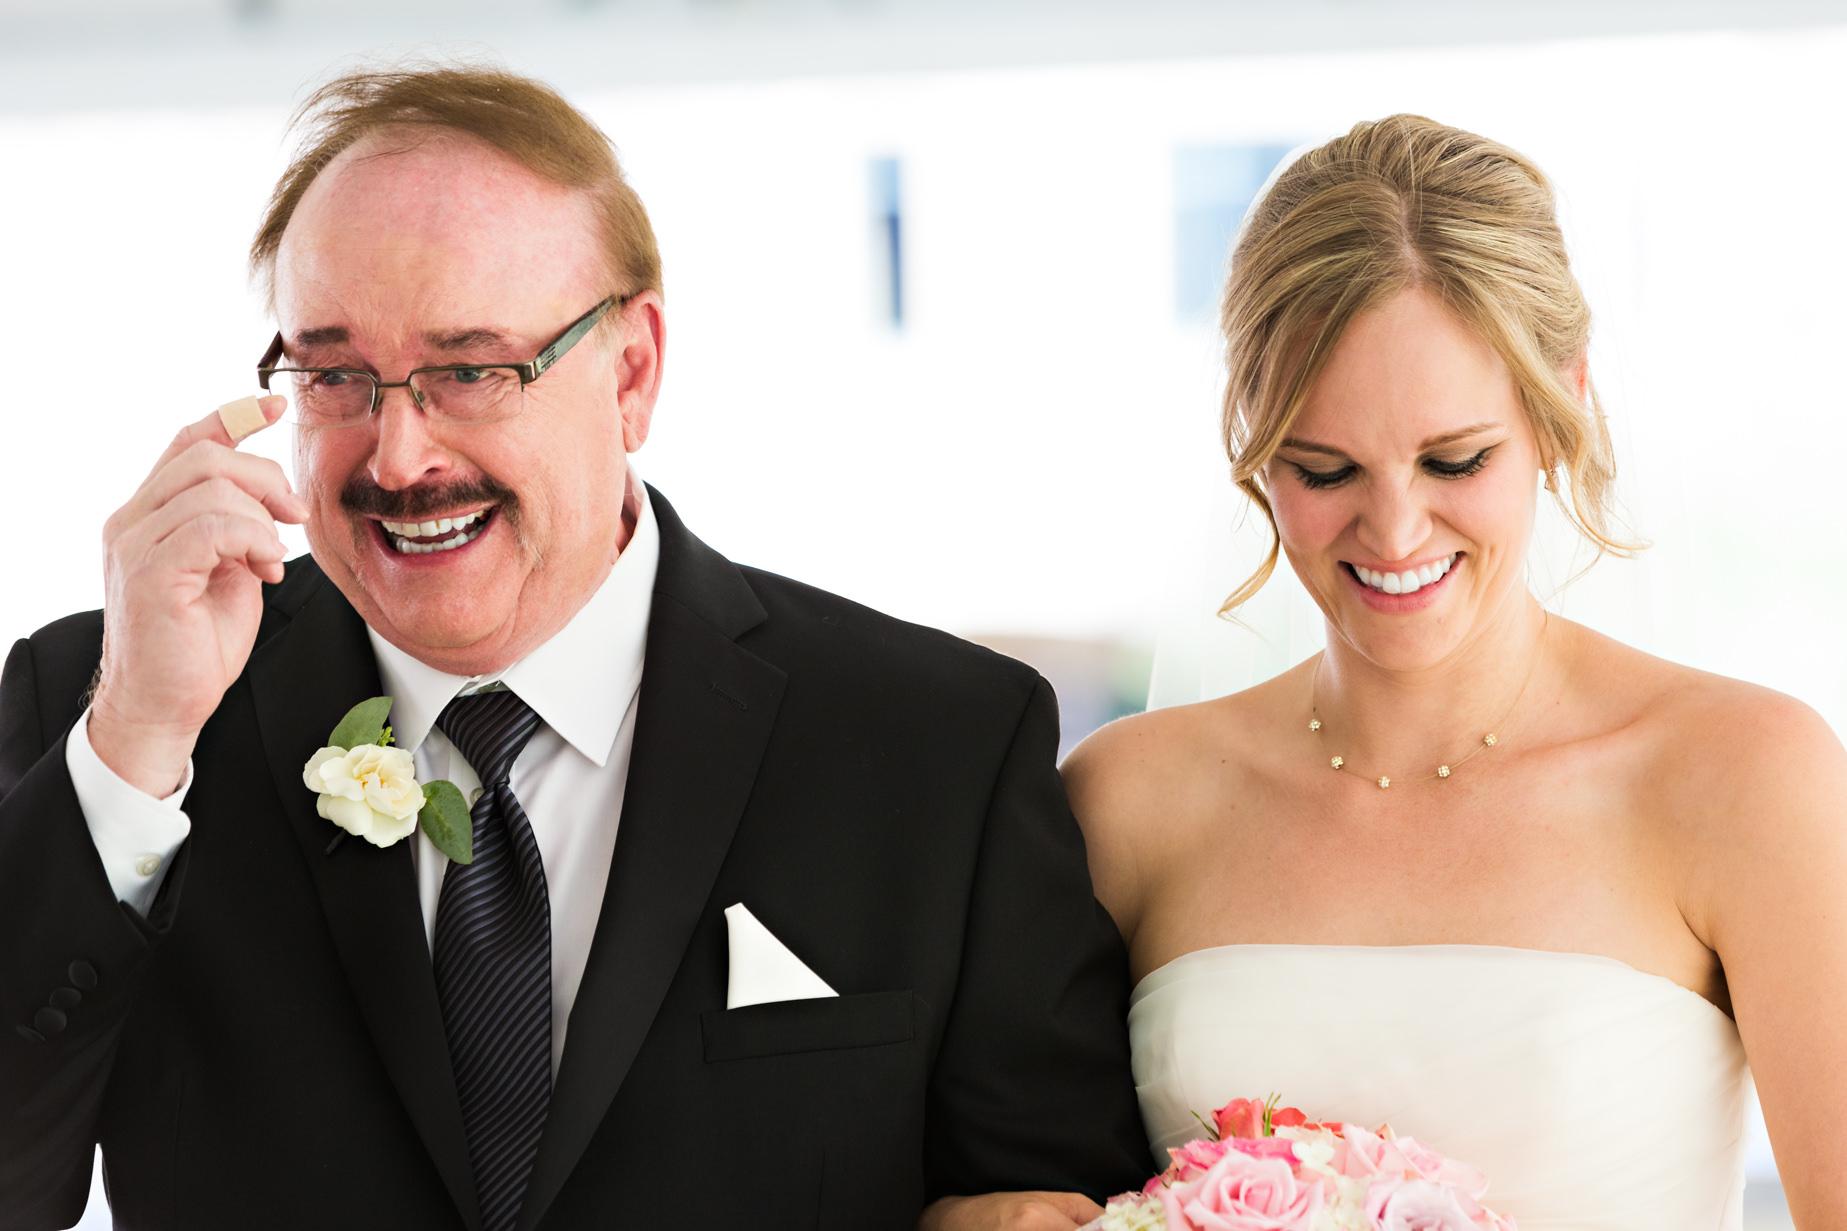 big-sky-resort-wedding-father-cries-while-walking-daughter-down-aisle.jpg